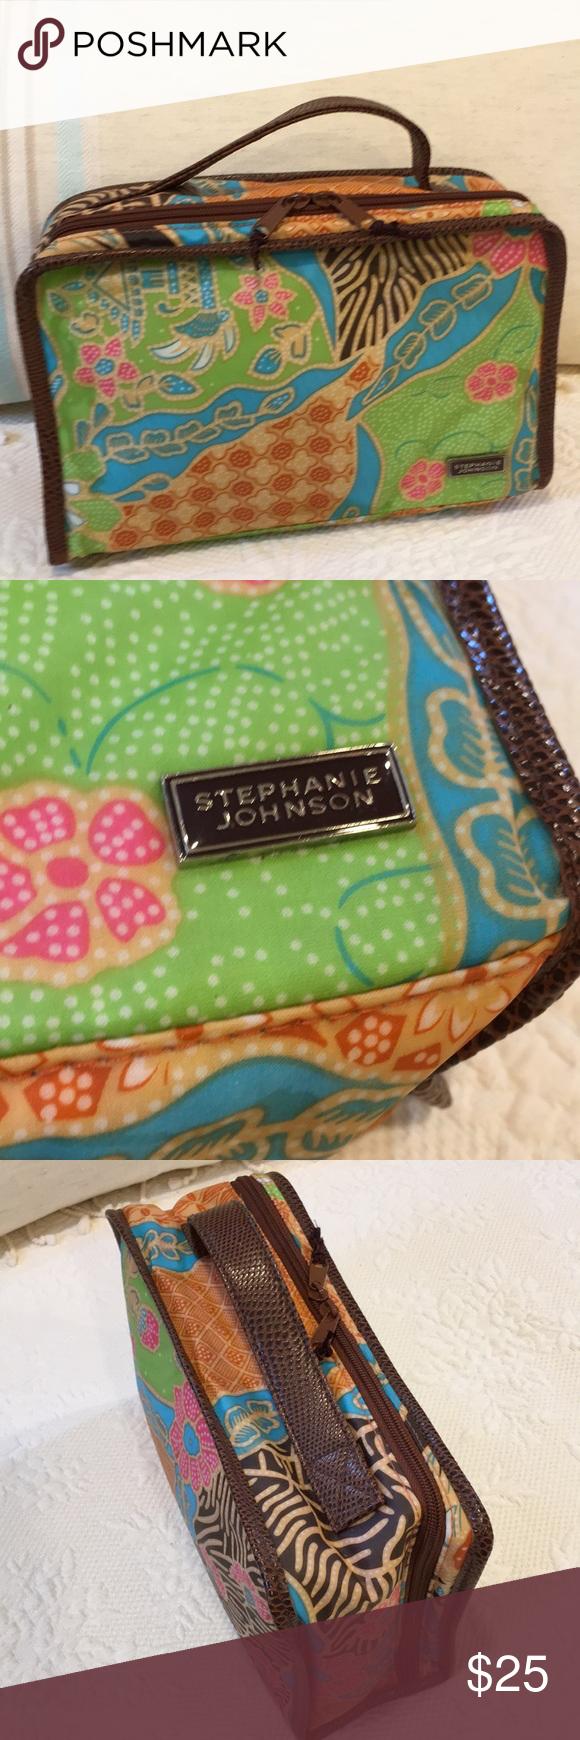 Stephanie Johnson cosmetic bag Cosmetic bag, Bags